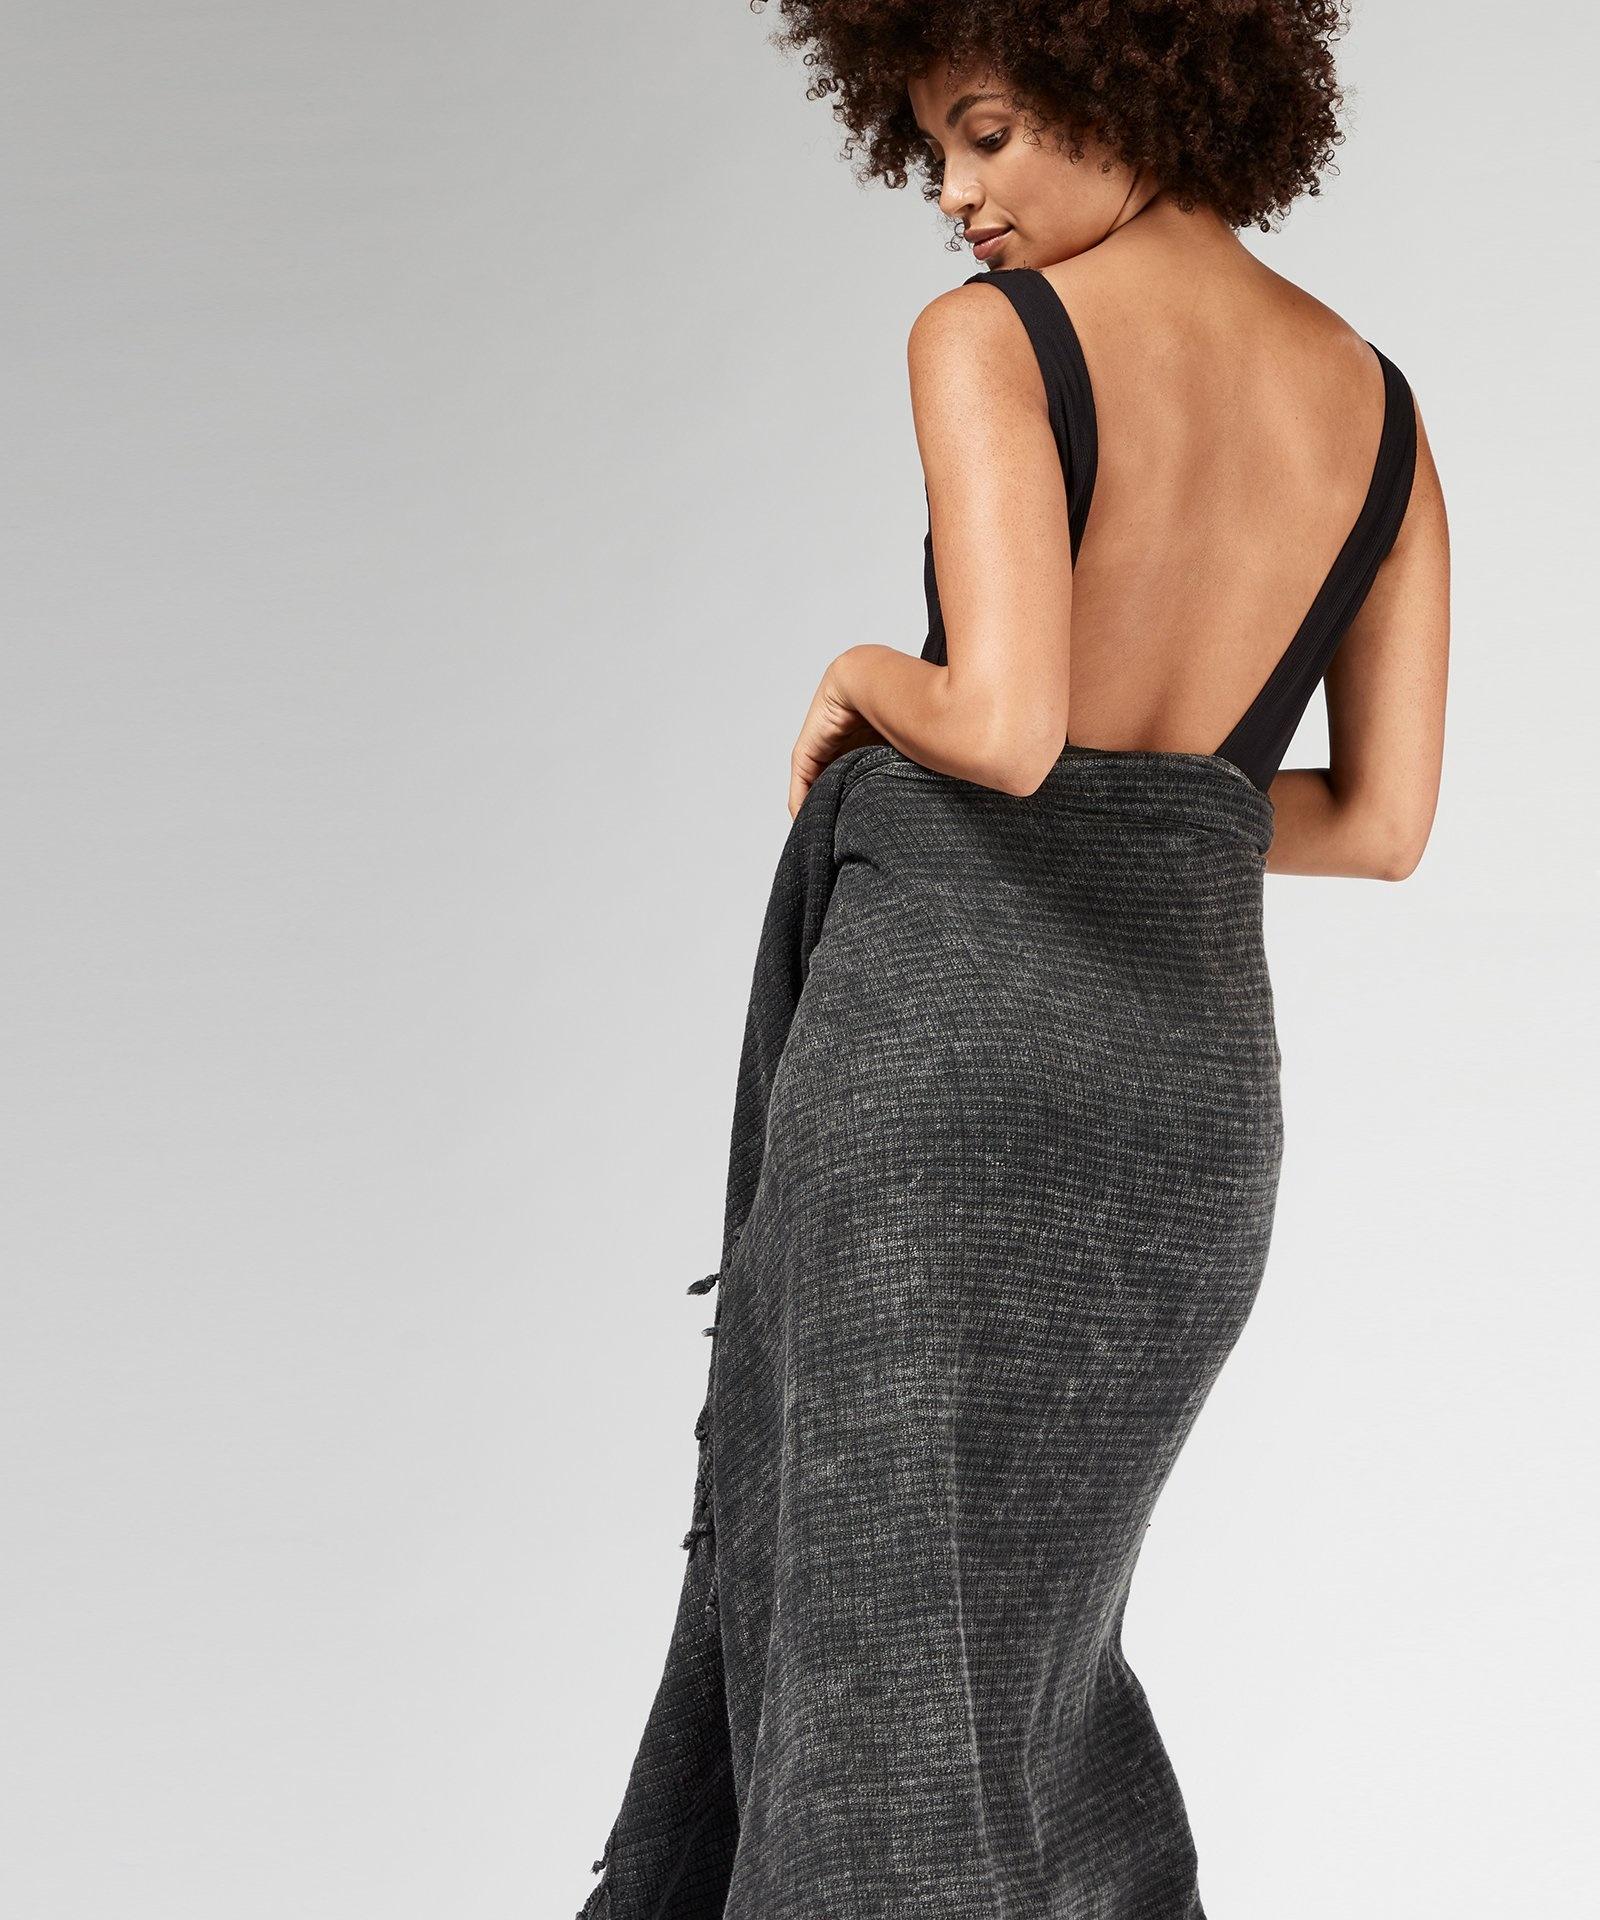 Handdoek hamam towel dark grey/blue-2